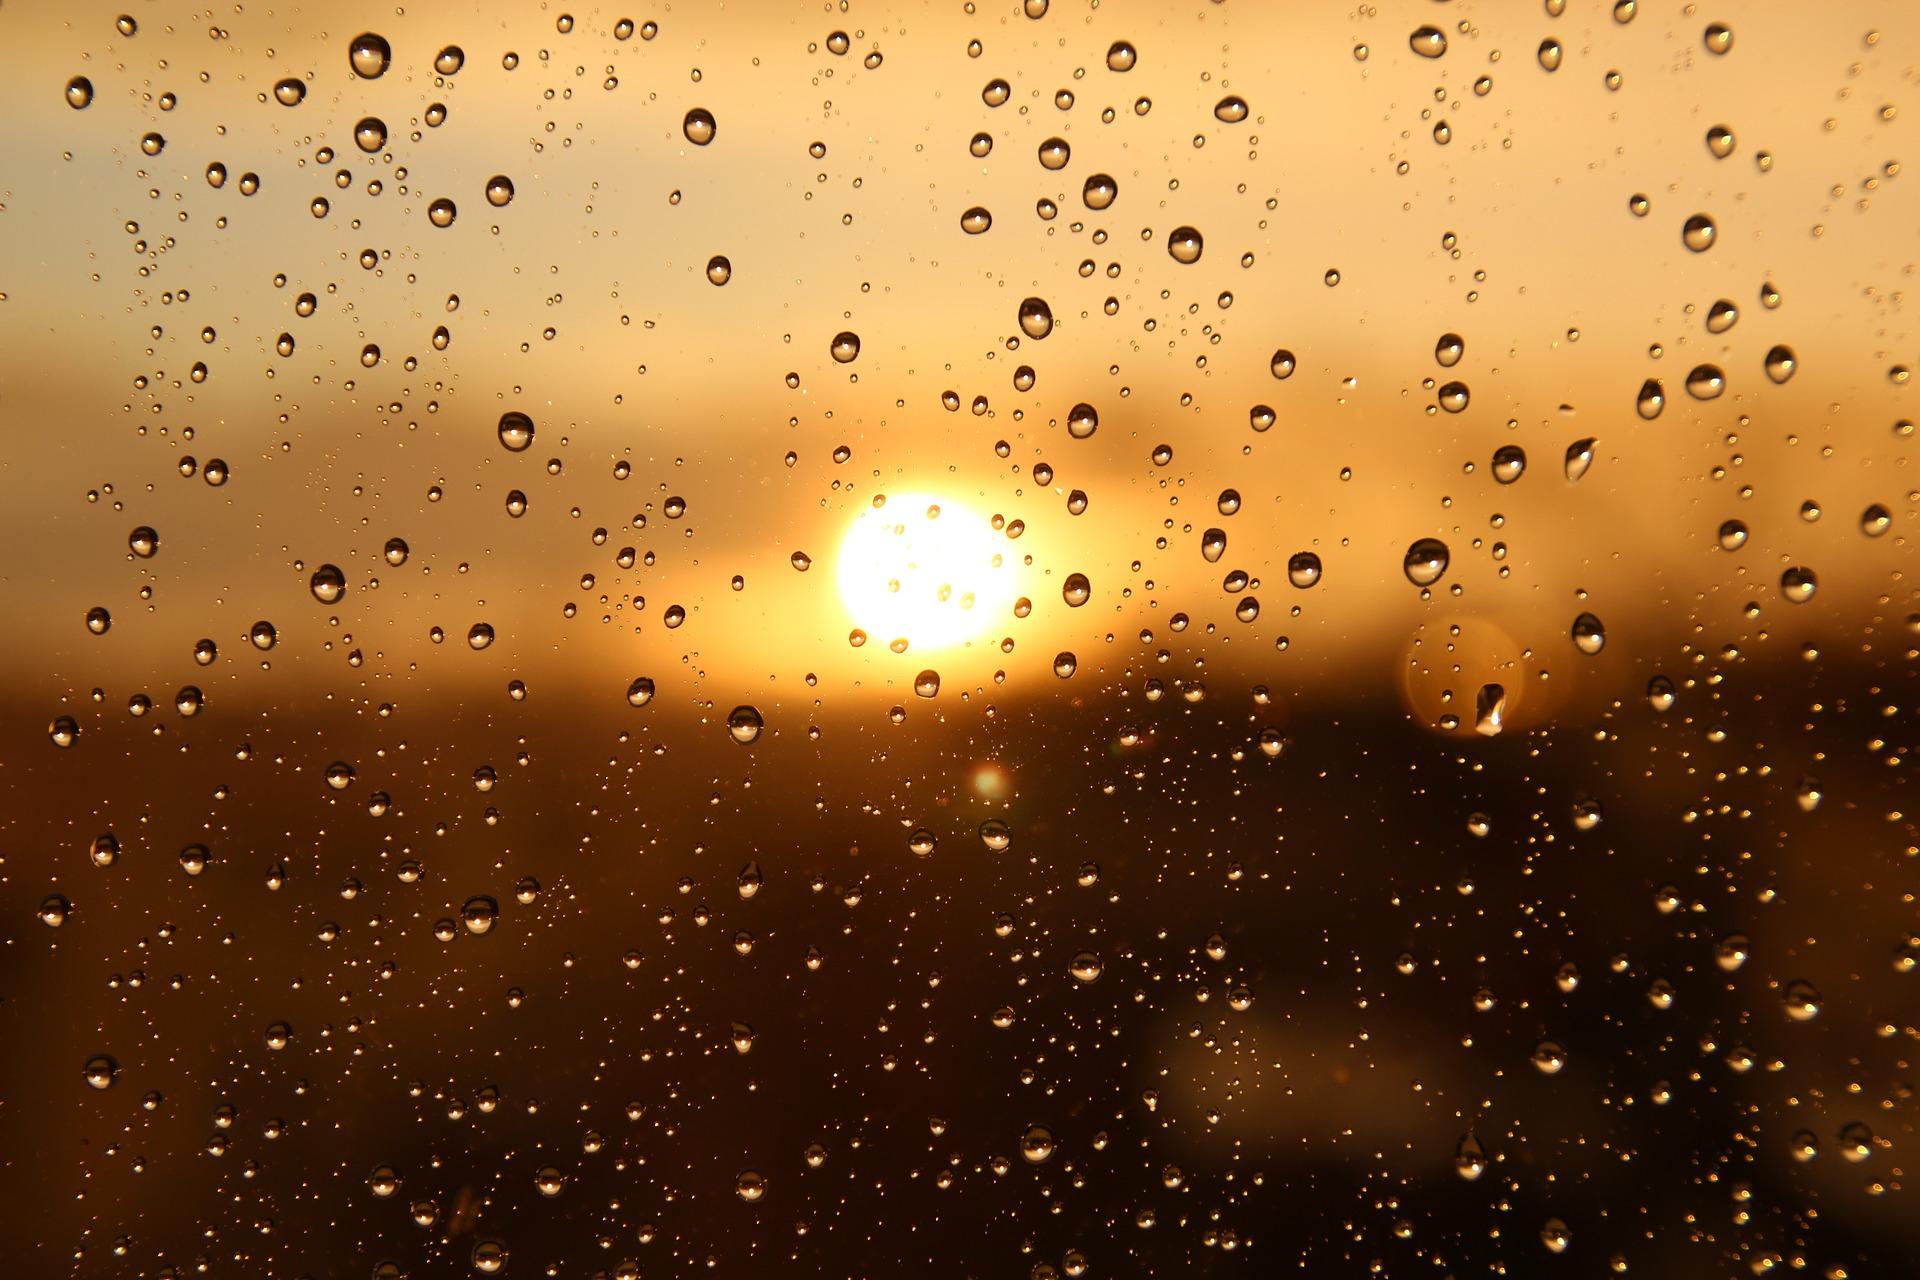 rain-3940580_1920